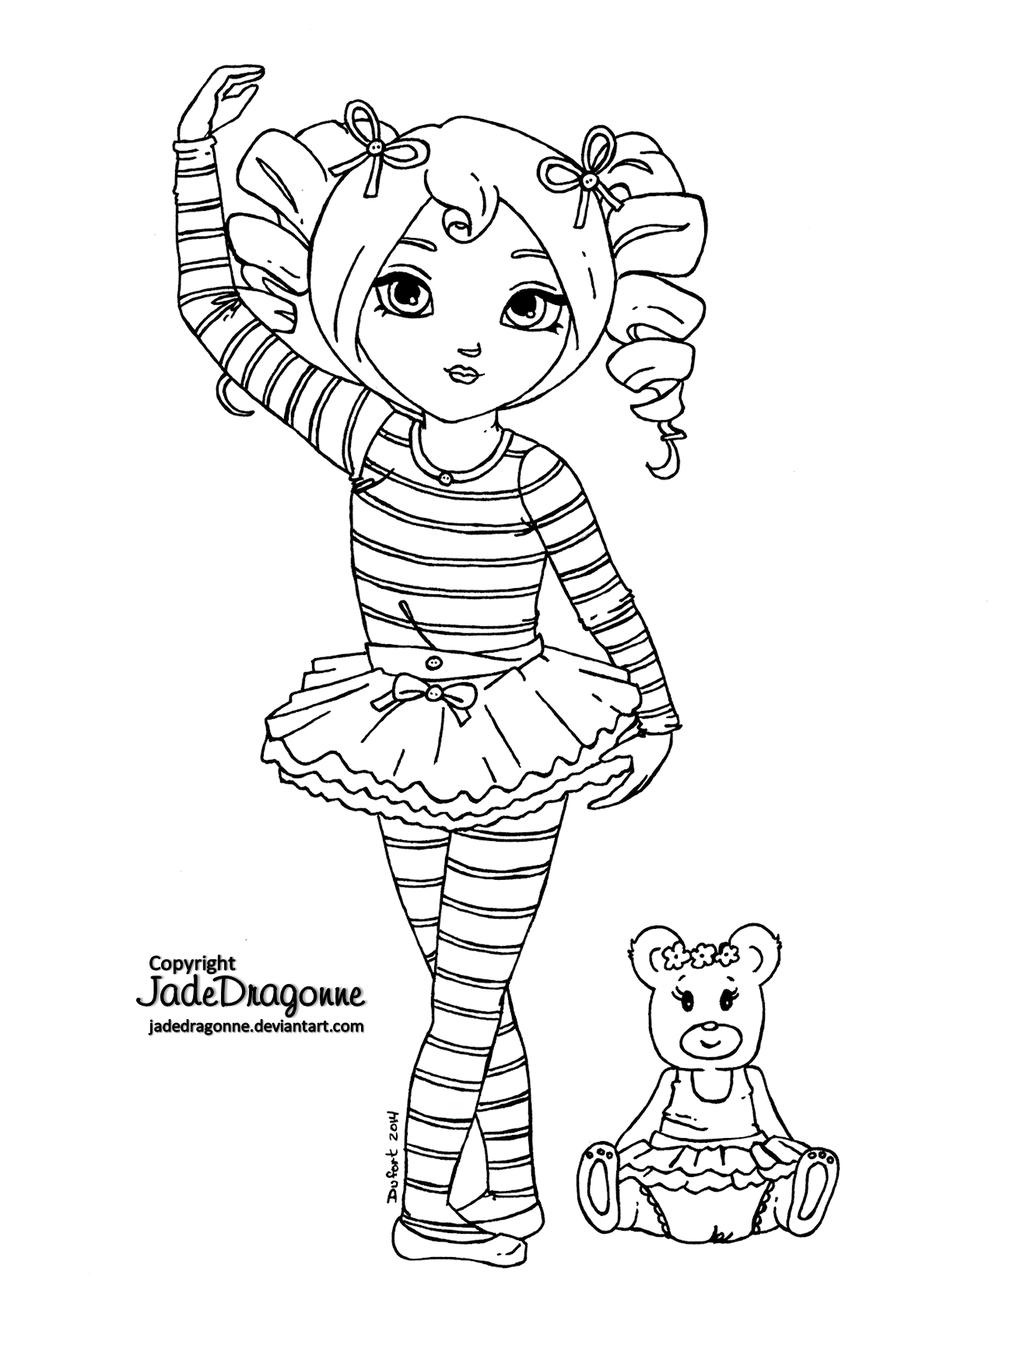 Little Ballerina By Jadedragonne.deviantart On dedans Zou Coloriage